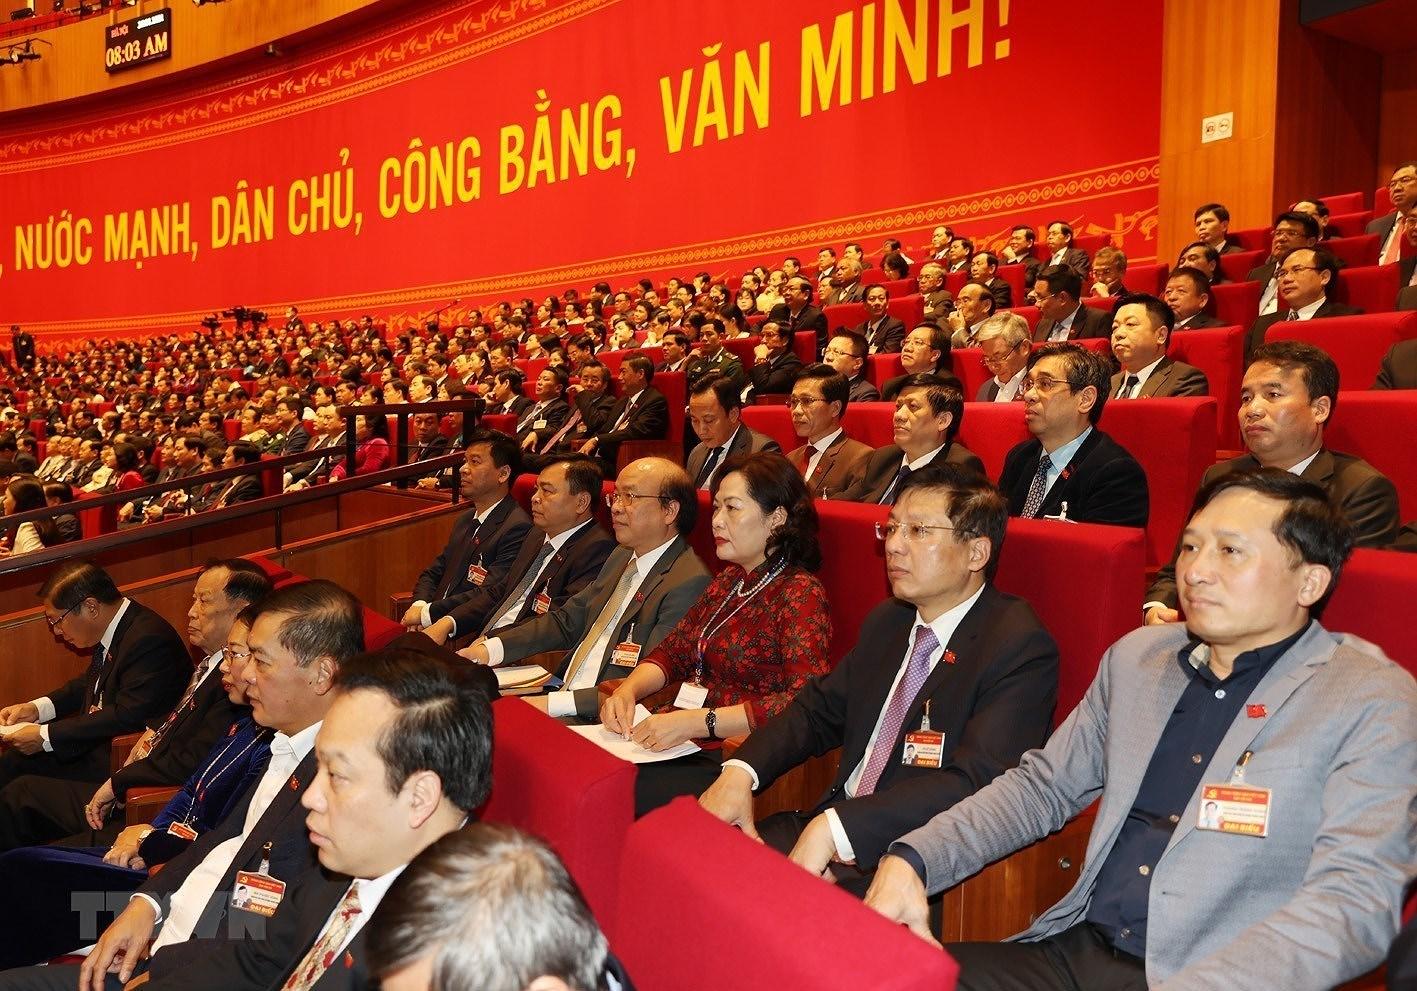 [Photo] Quang canh phien thao luan cac van kien Dai hoi XIII cua Dang hinh anh 9